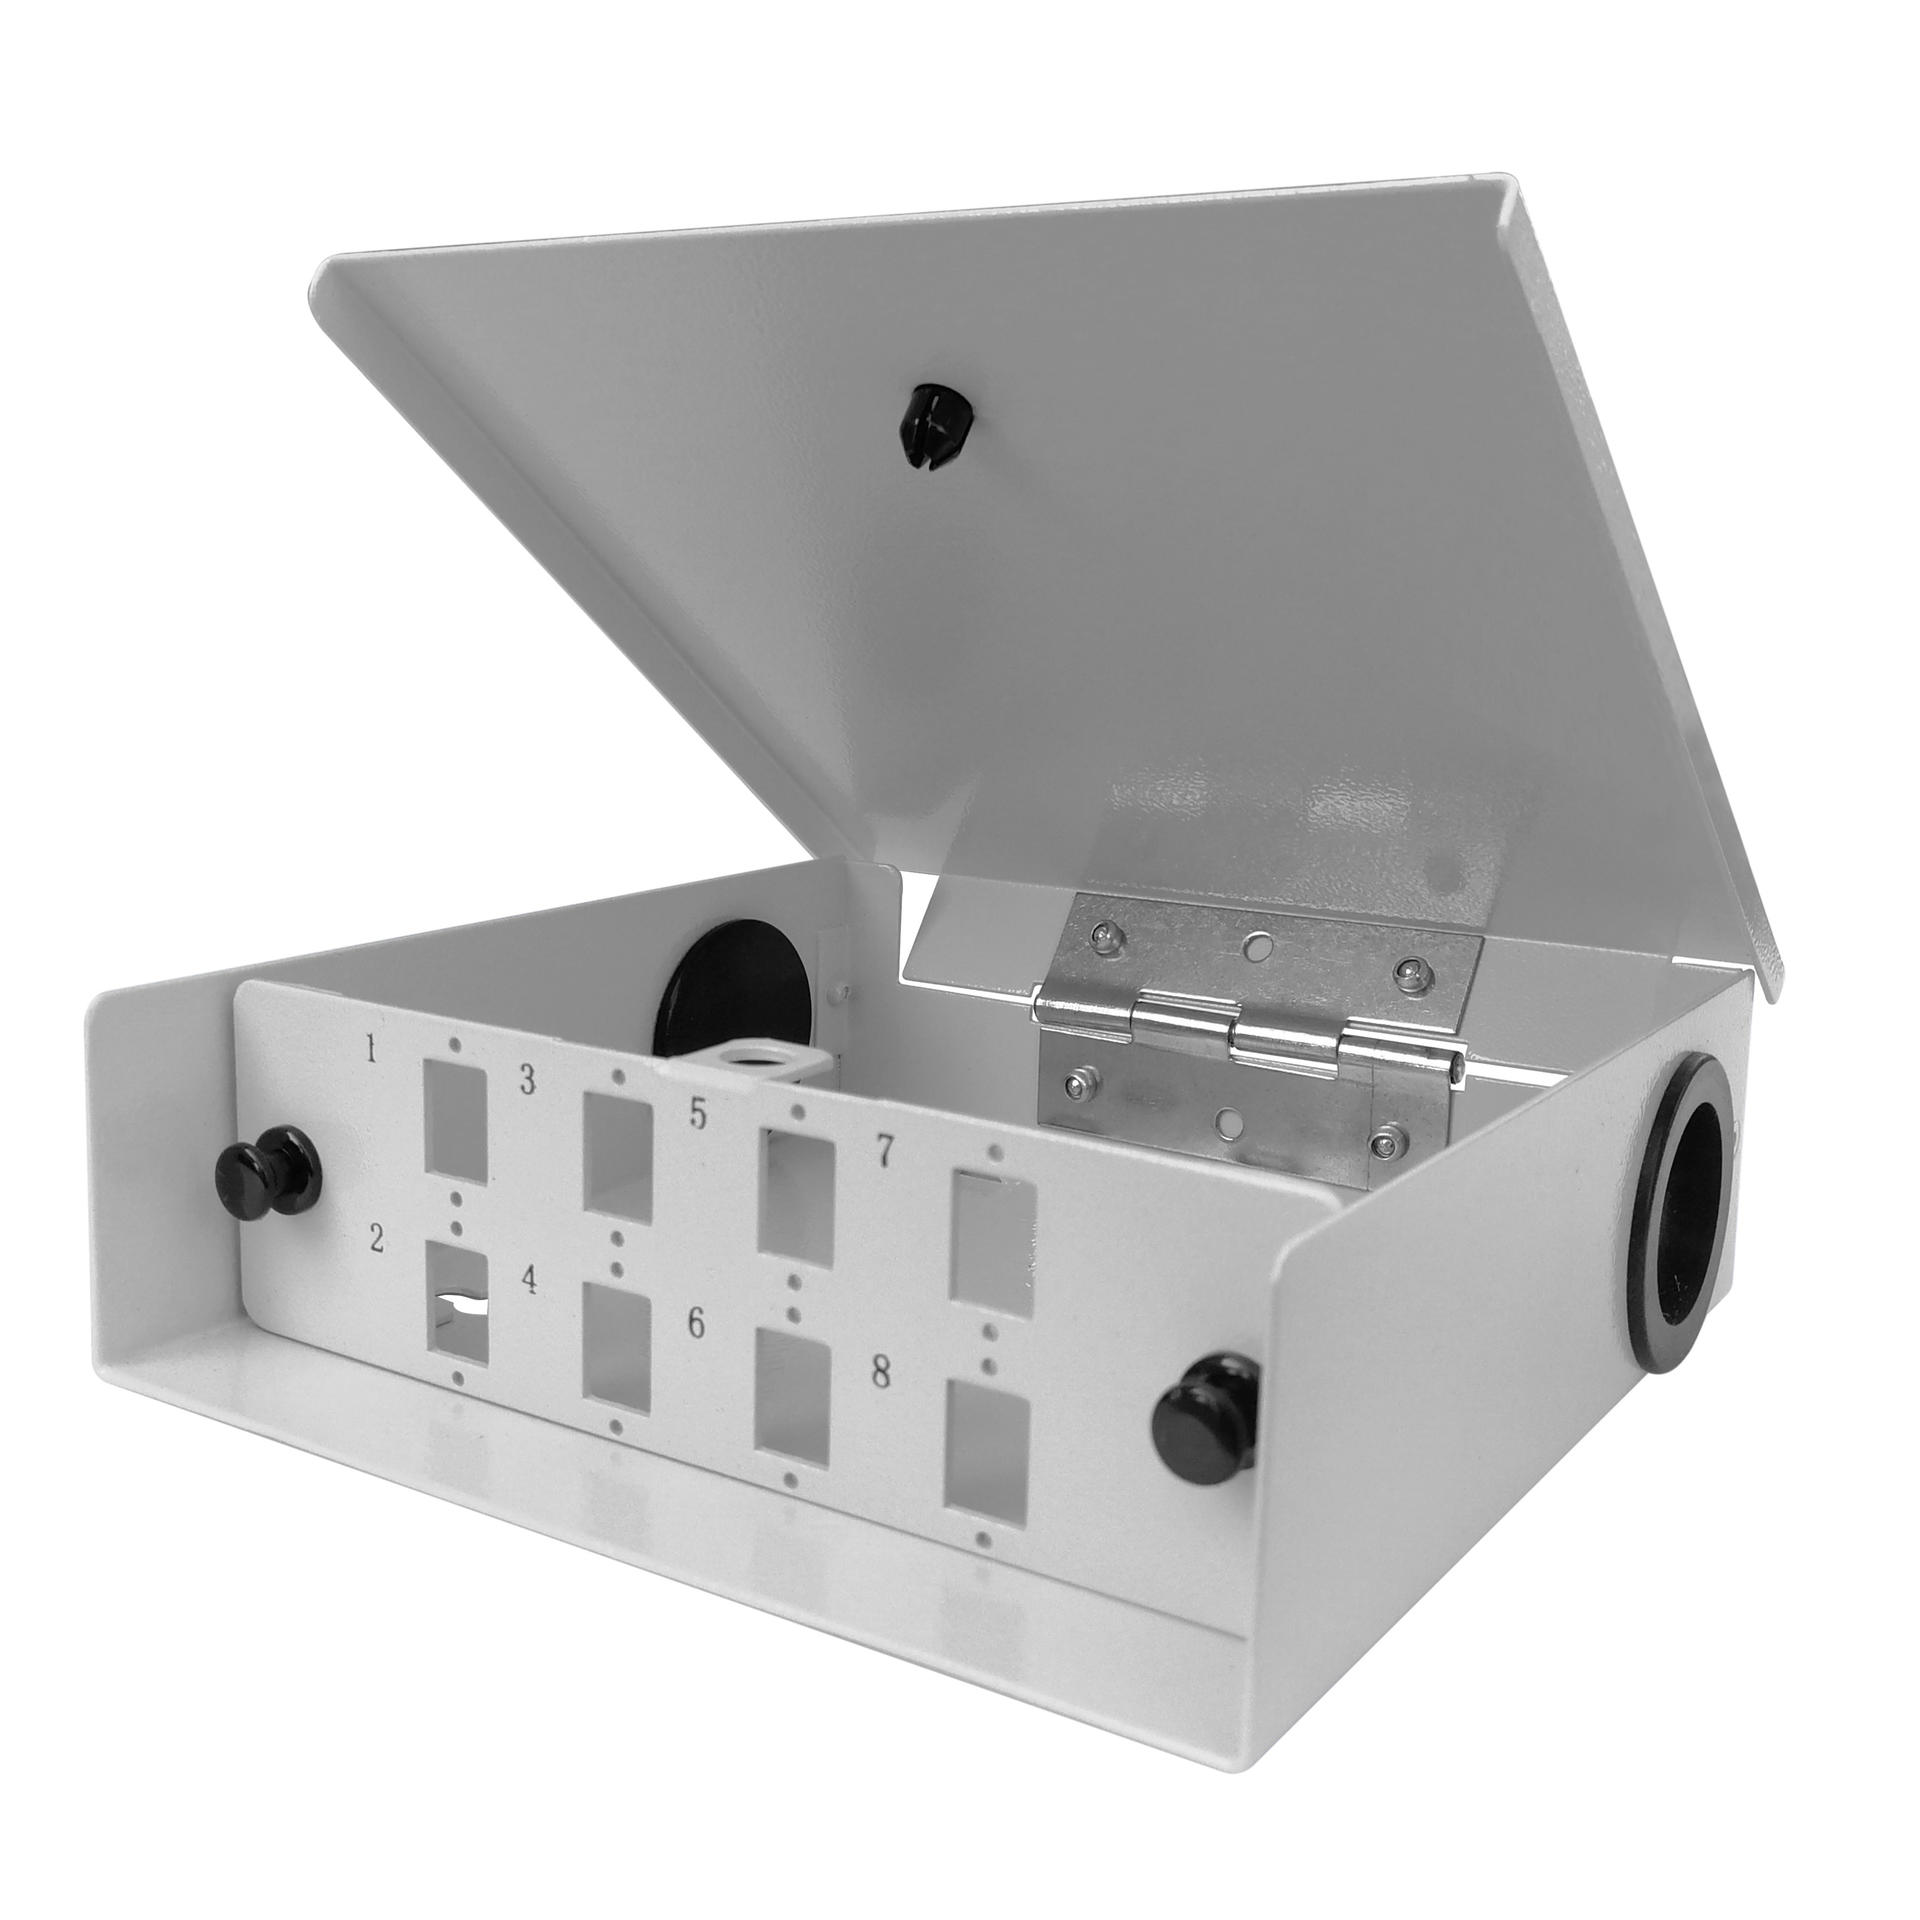 8 Port WODF Fiber Optic Distribution Box, SC Simplex